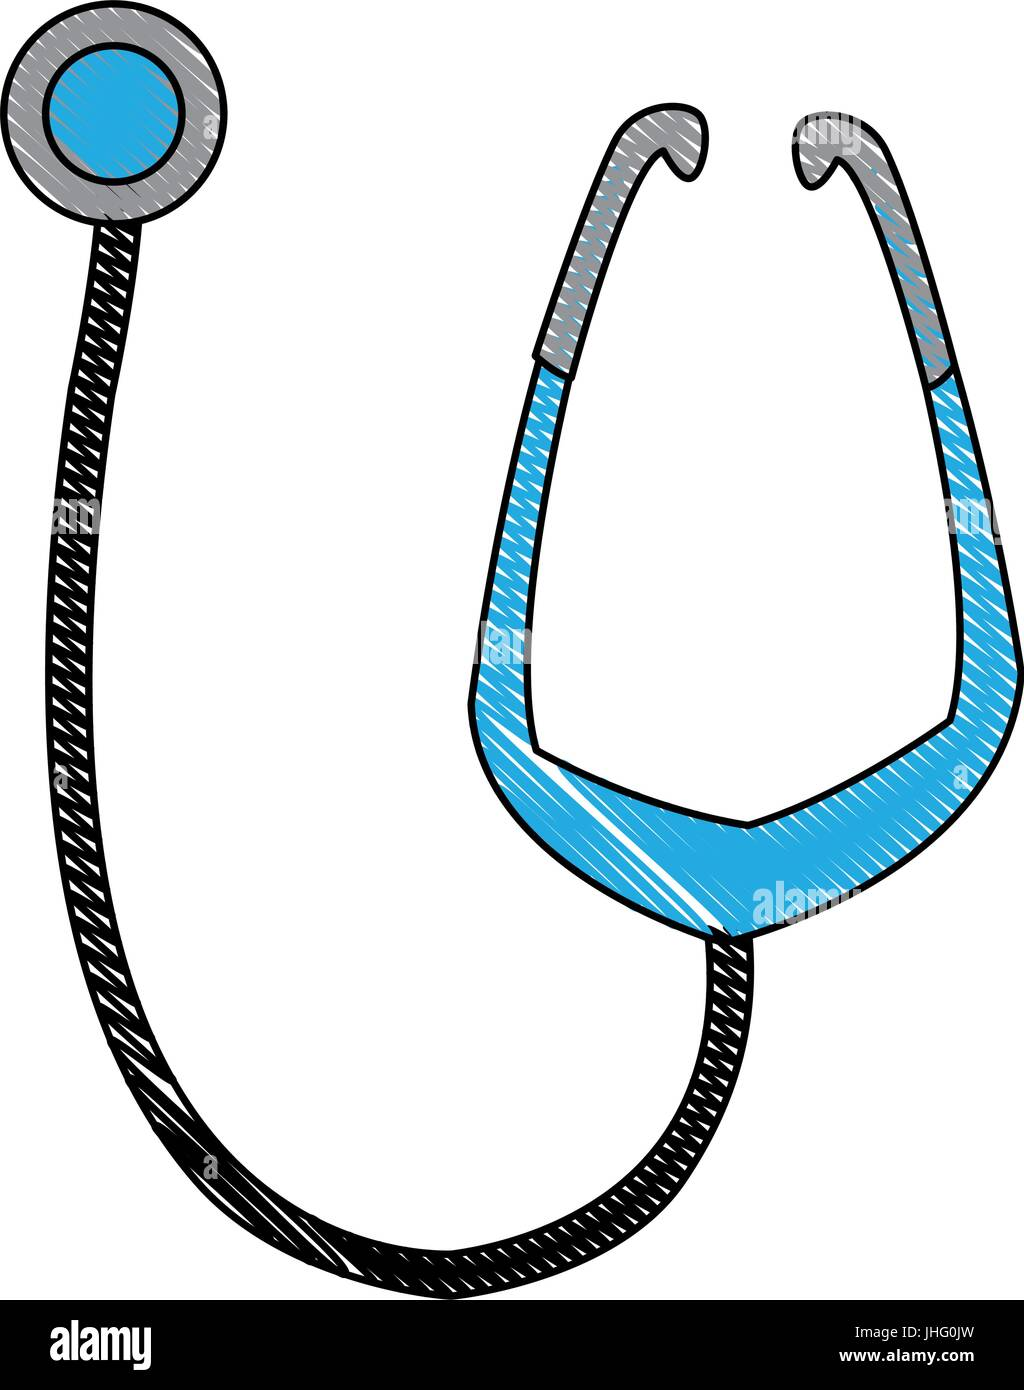 medical stethoscope equipment medicine diagnosis healthcare - Stock Image